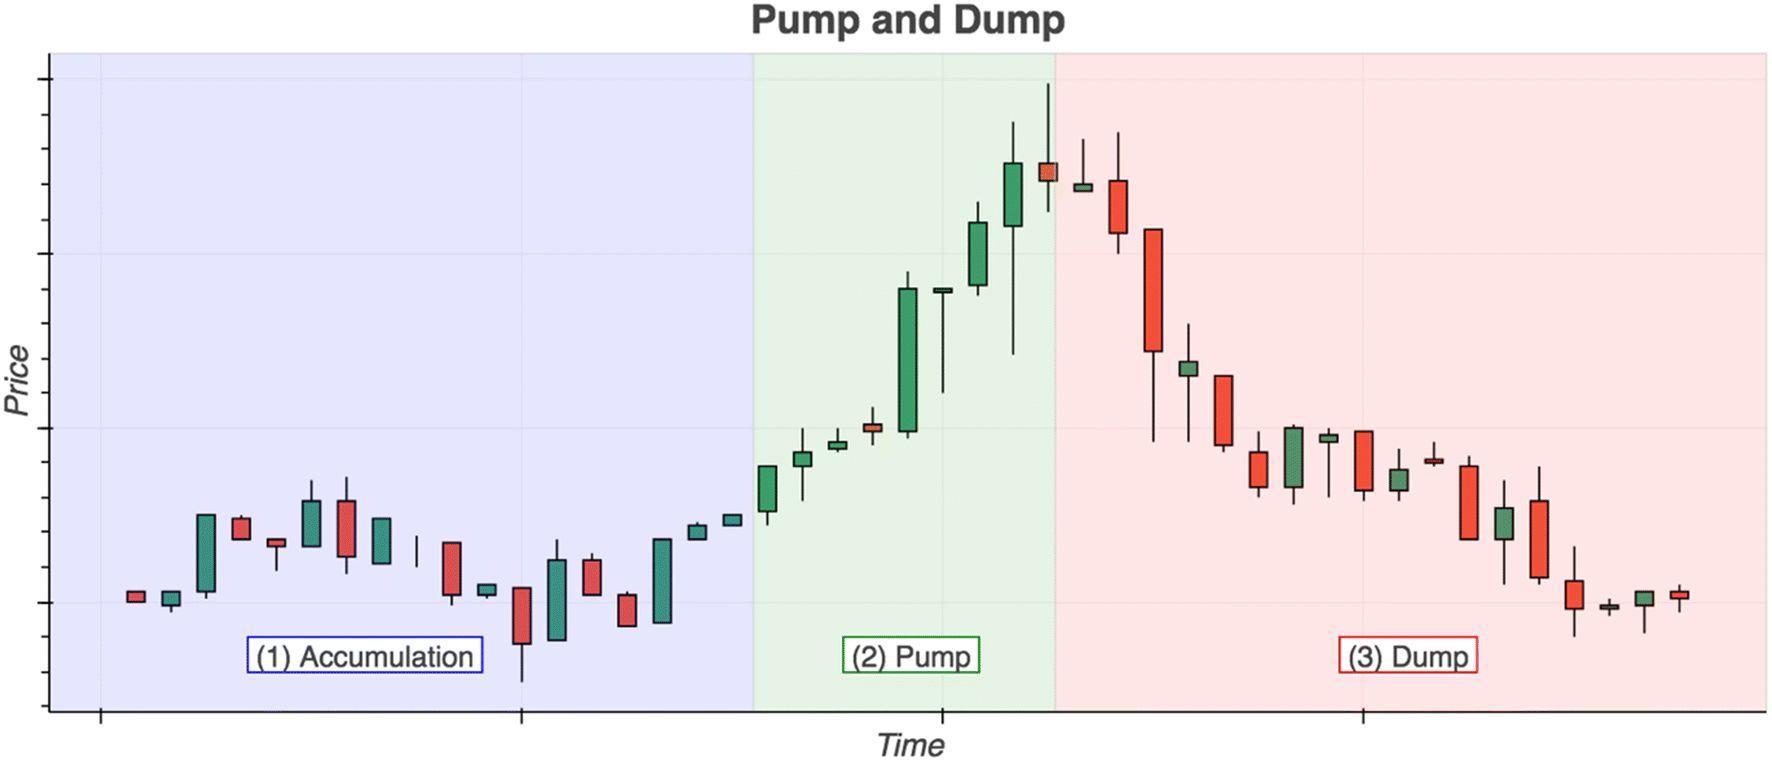 Pump-and-dump